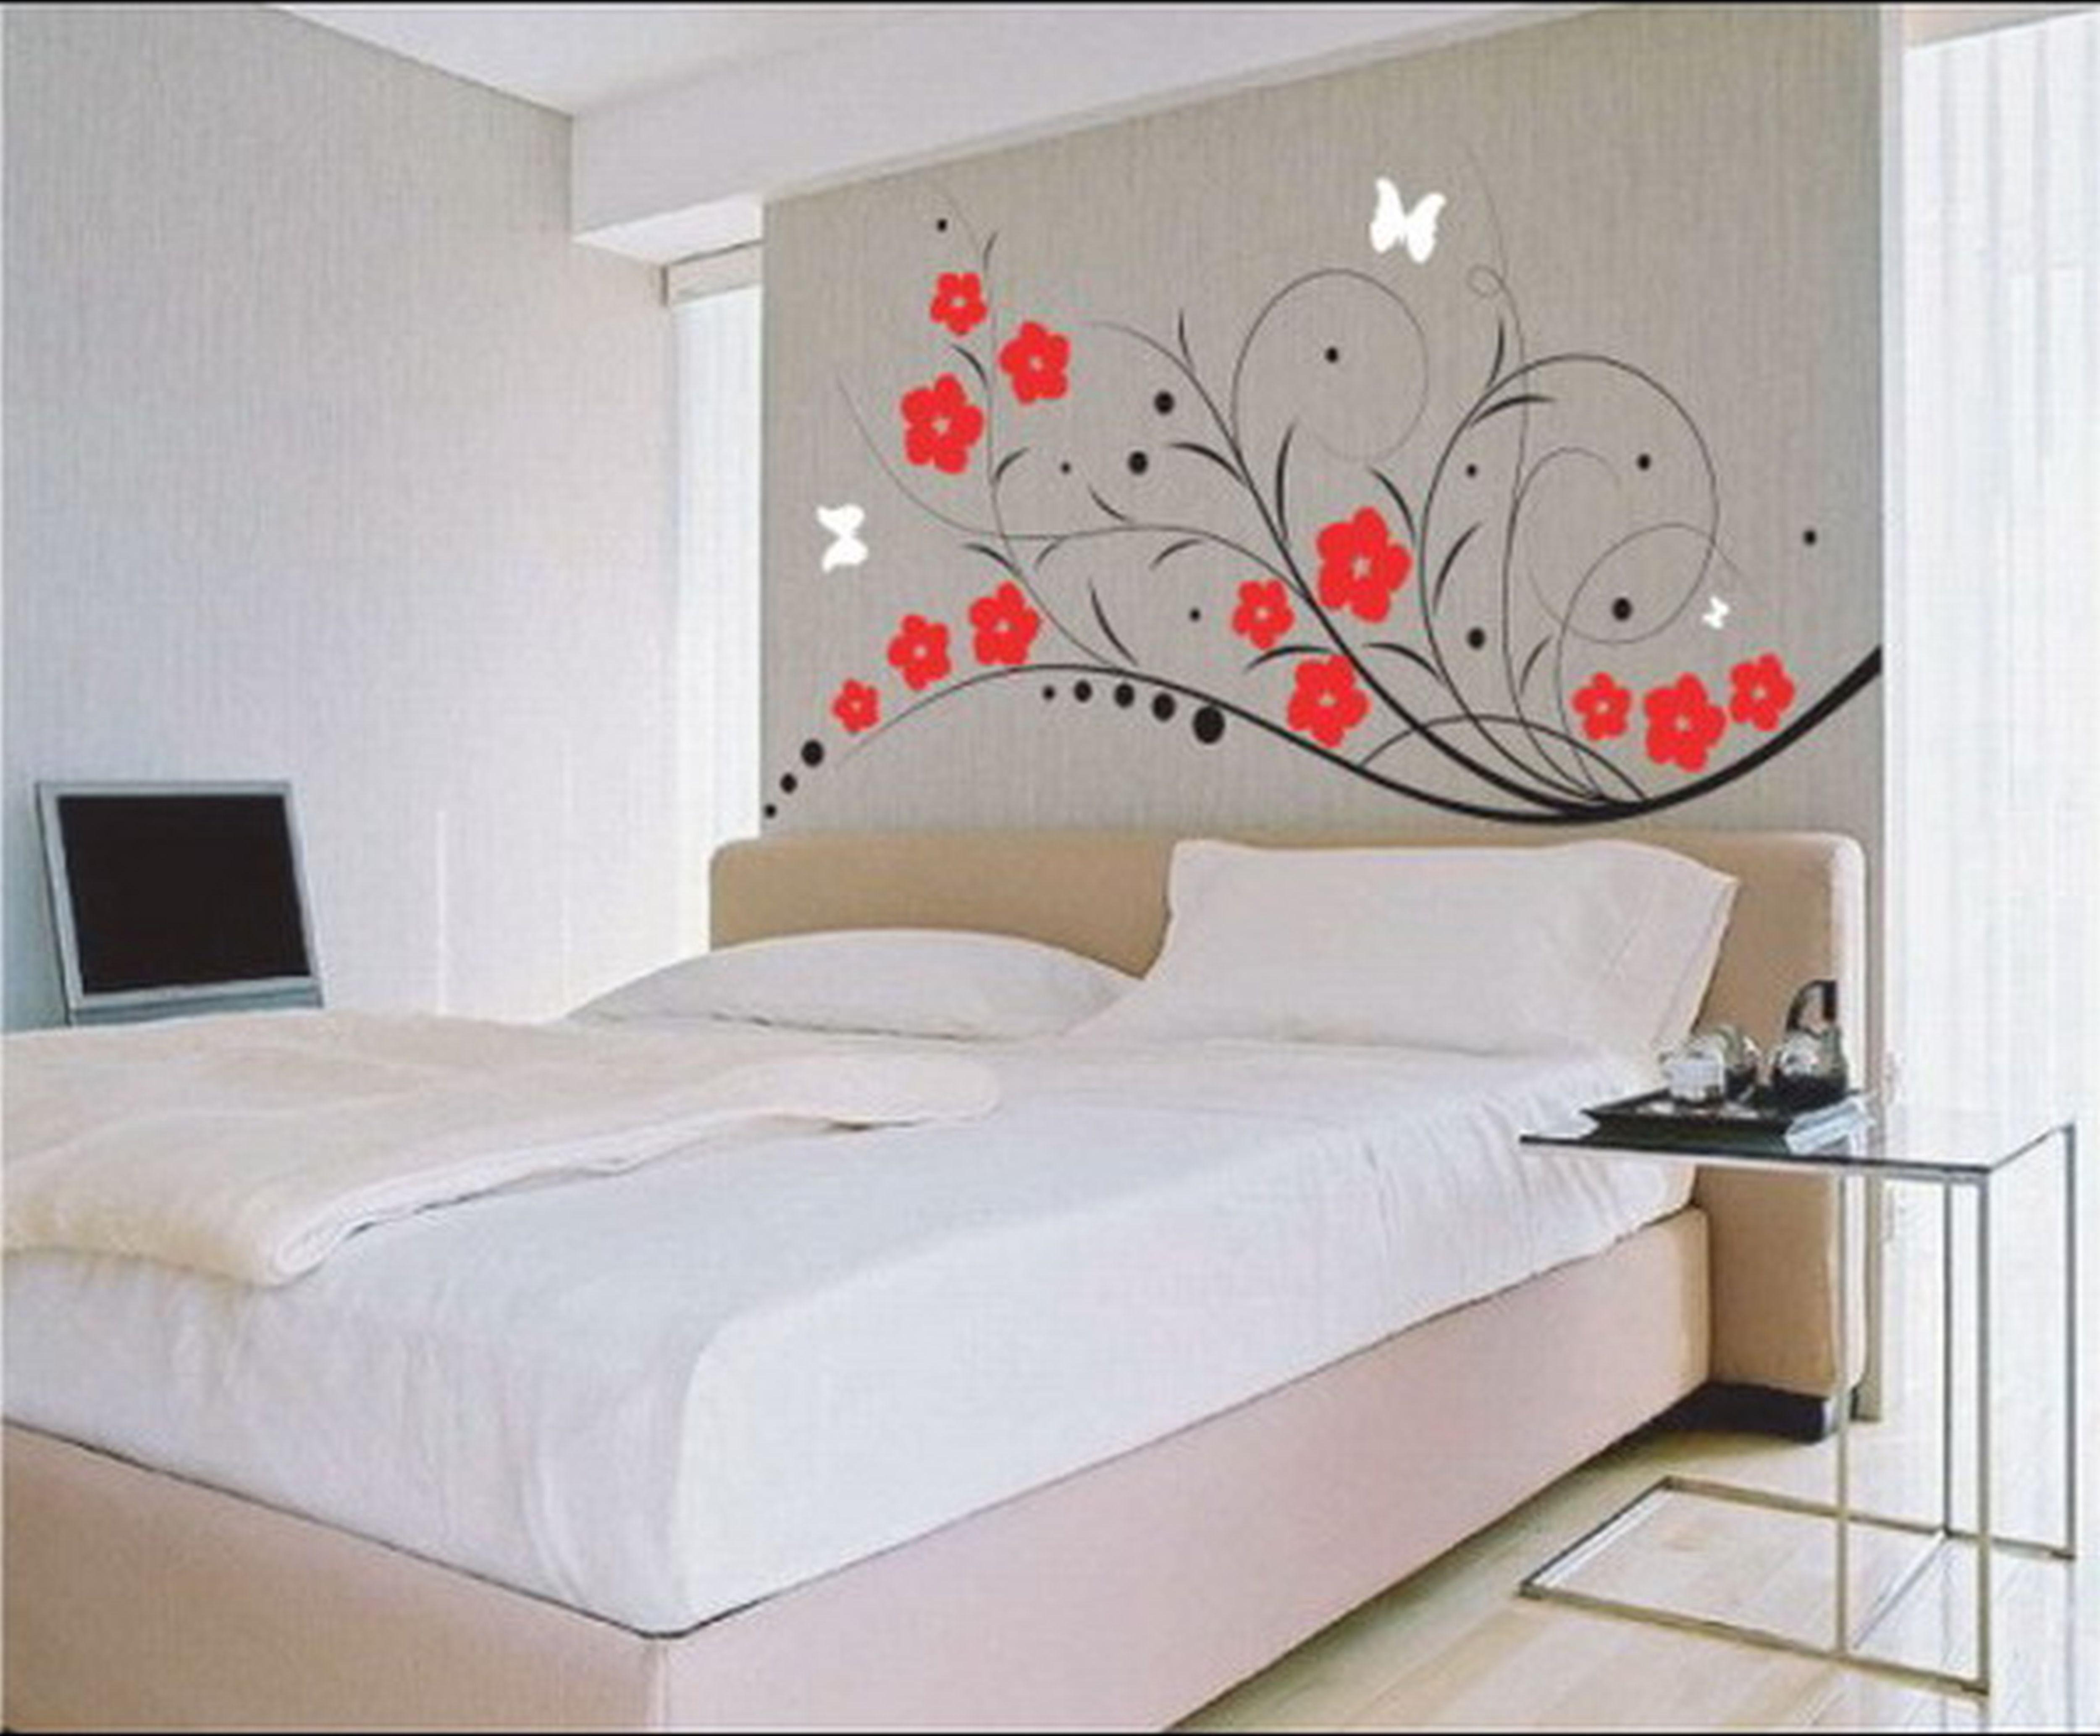 New Easy Bedroom Decorating Ideas With Easy Diy Bedroom Wall Art Above Headboard Inexpensive Bedroom Wall Designs Master Bedroom Wall Decor Wall Decor Bedroom